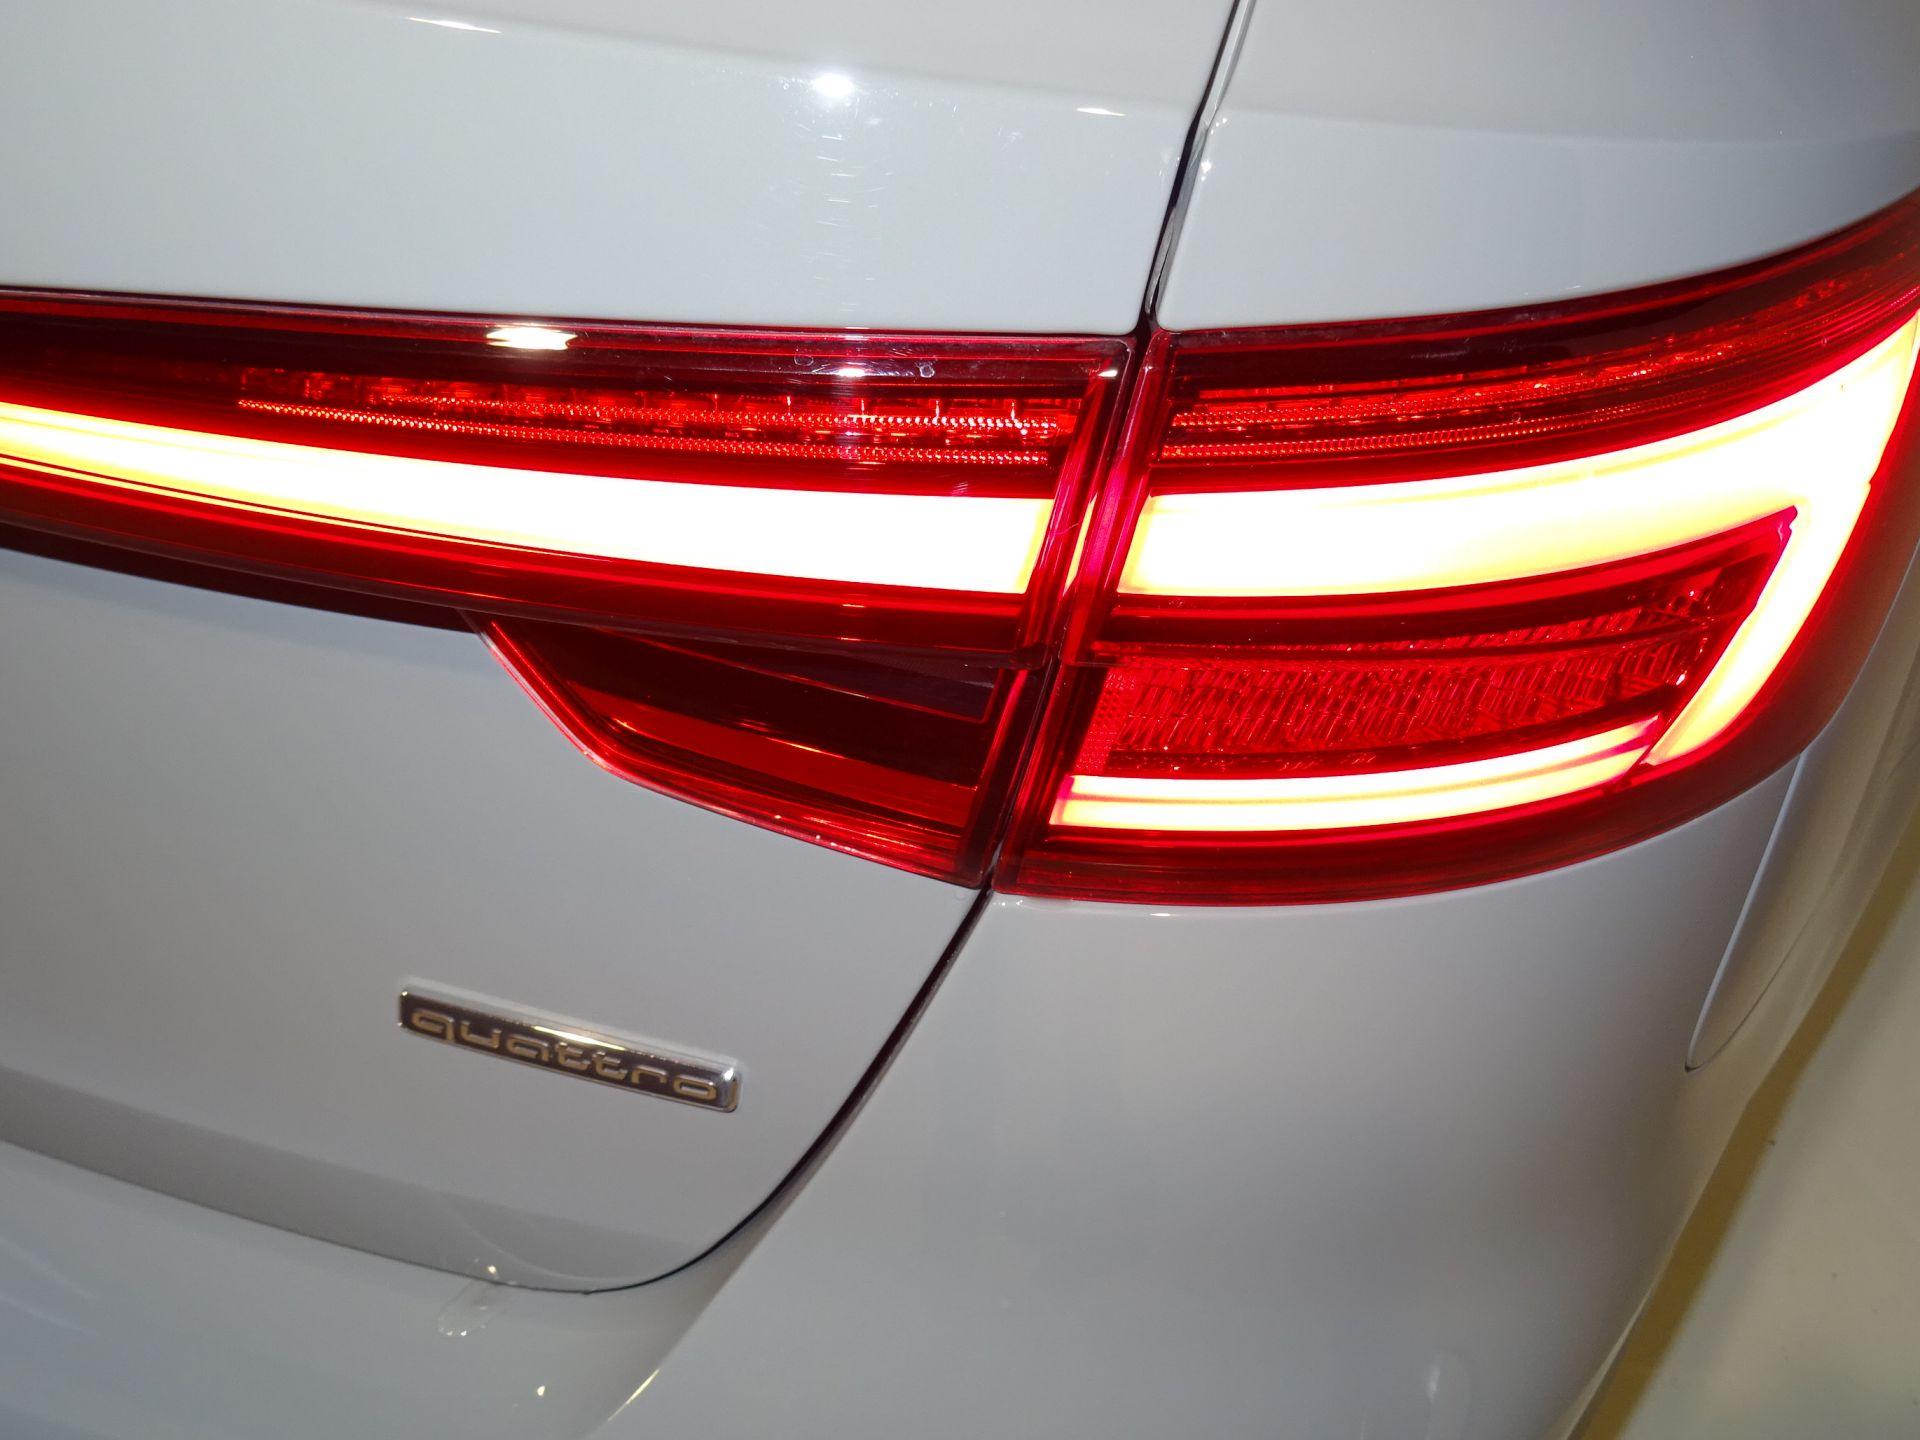 Audi A4 Avant S line 40 TDI 140kW quattro S tron